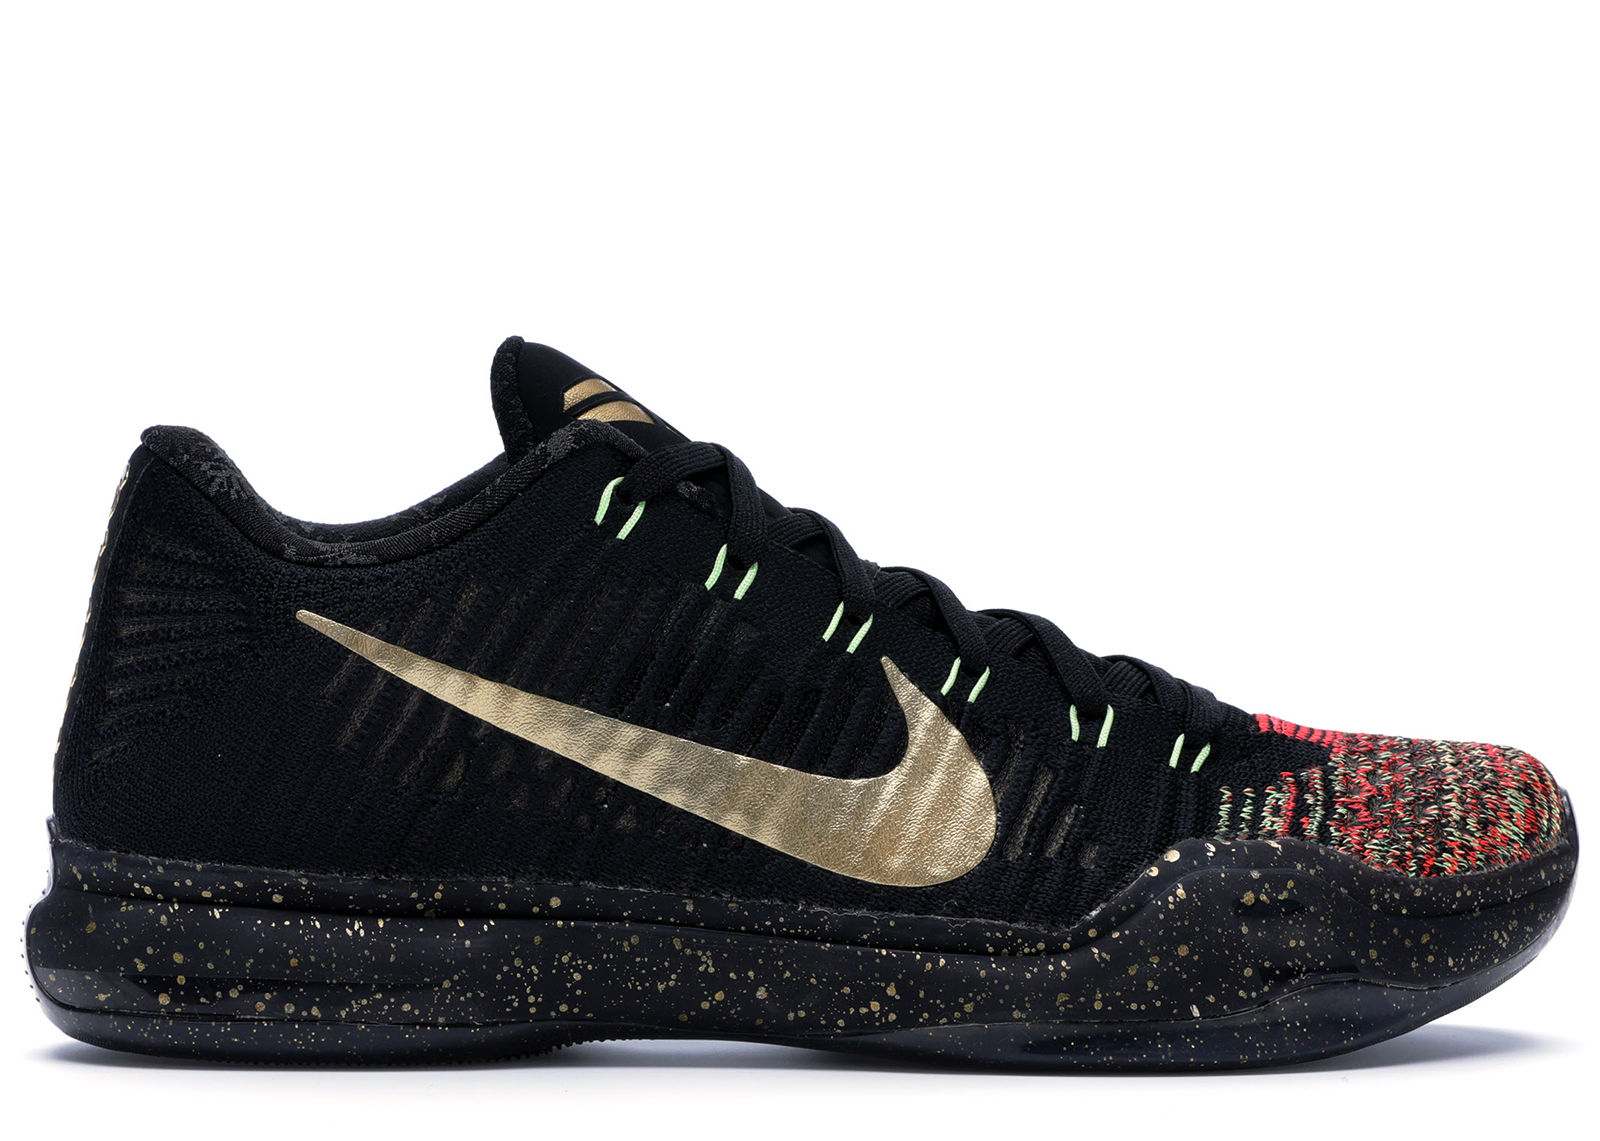 Nike Kobe 10 Elite Christmas